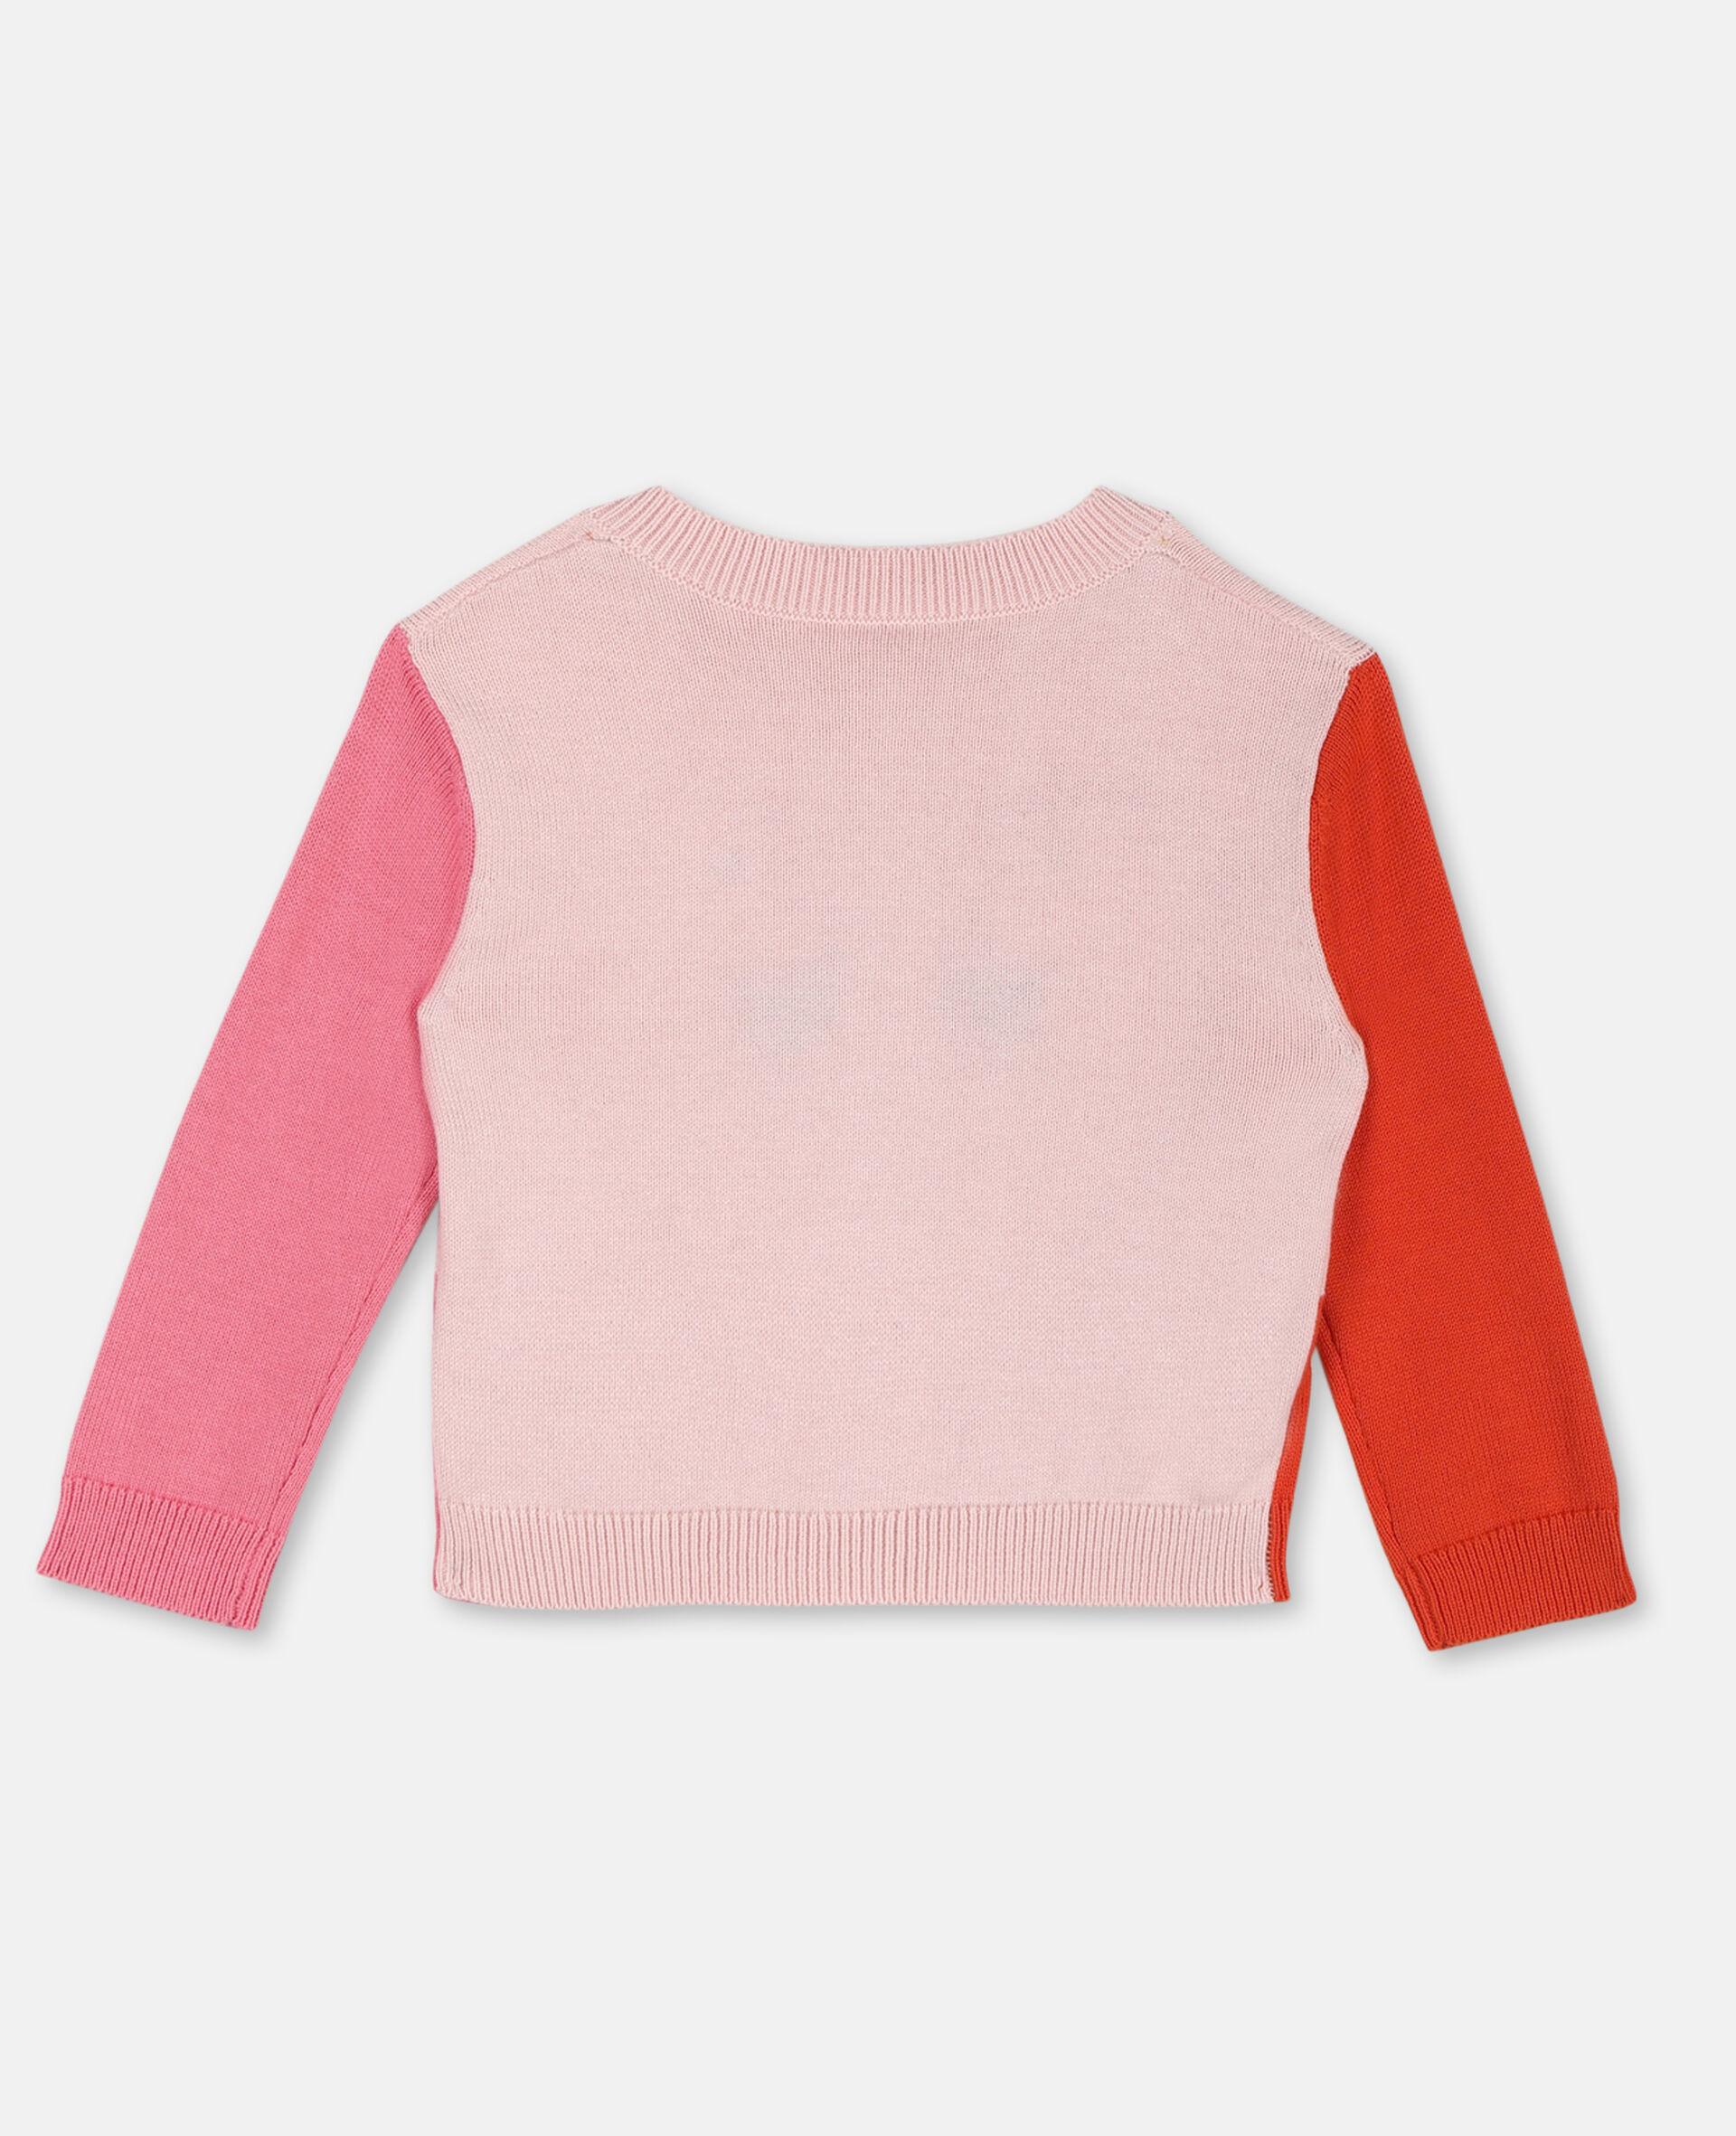 Flamingo Intarsia Knit Cotton Cardigan -Pink-large image number 3